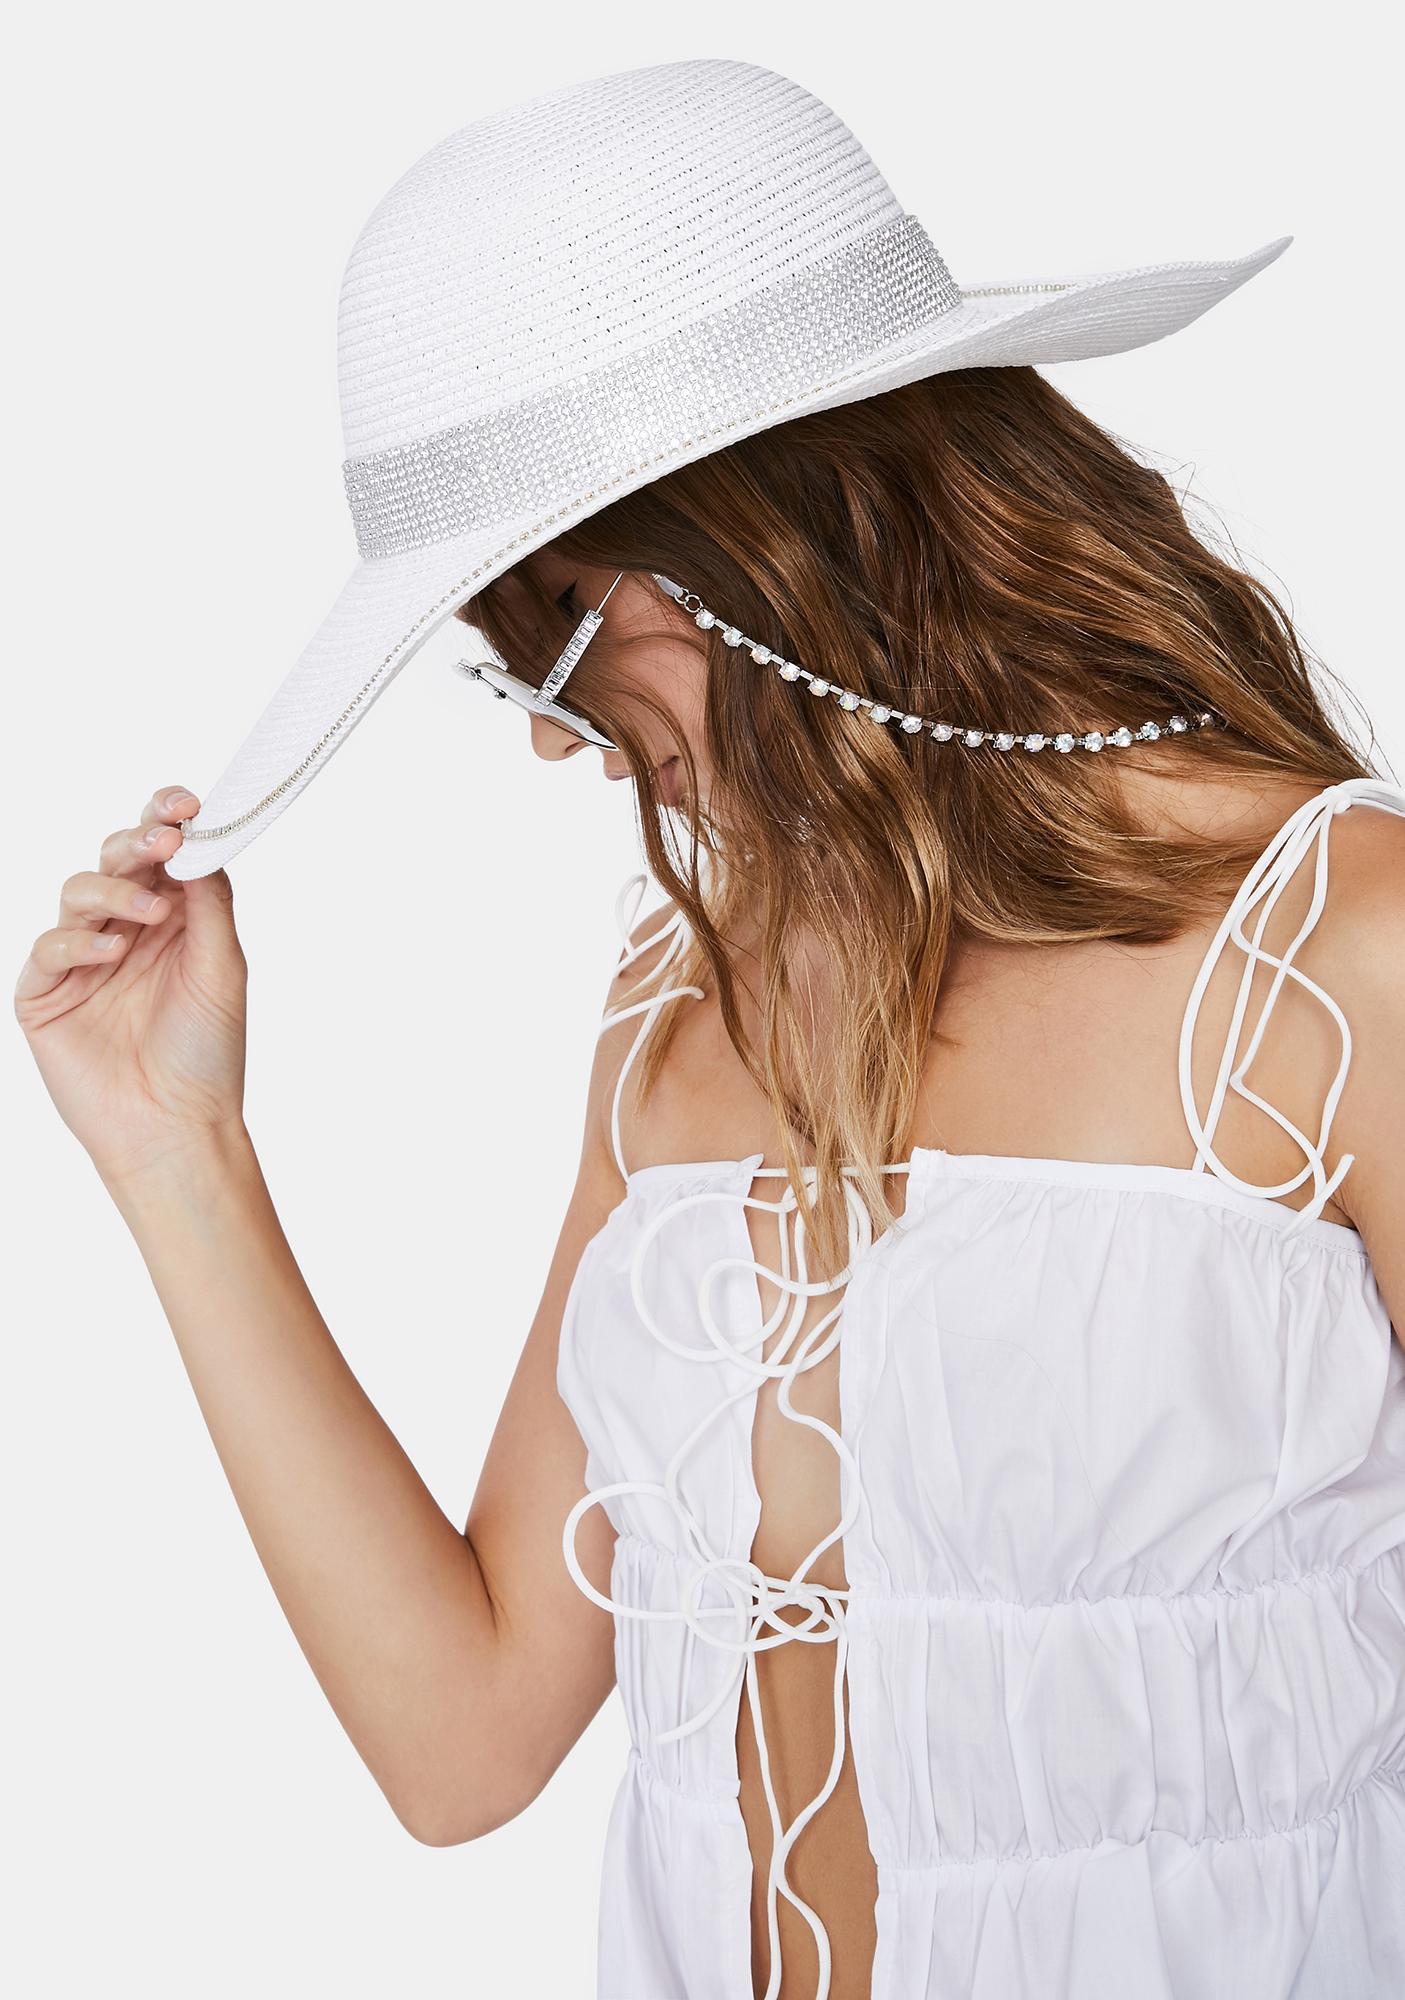 Icy Boho Bling Straw Hat